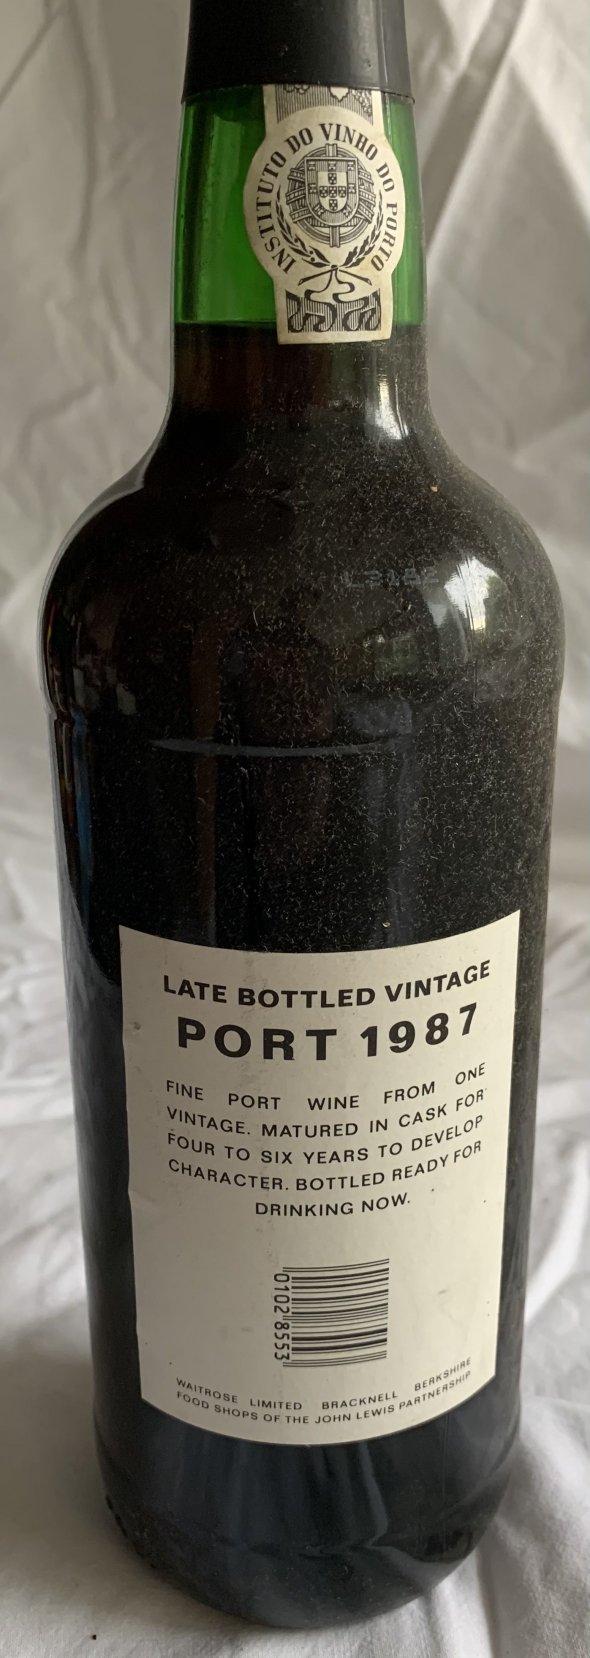 Waitrose late bottled vintage port